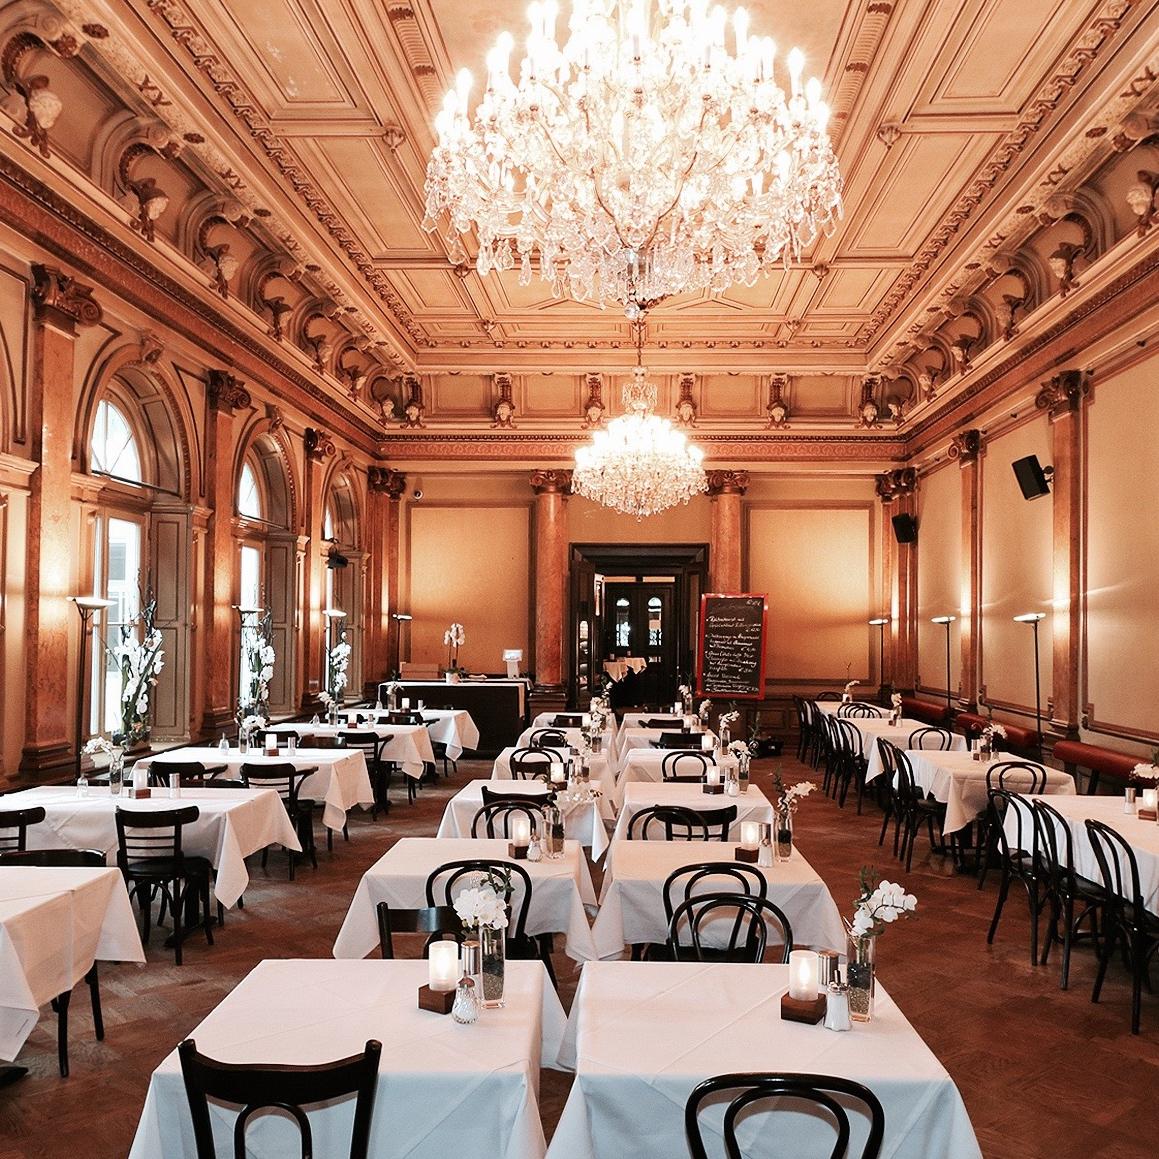 Grand Café im Literaturhaus in Hamburg